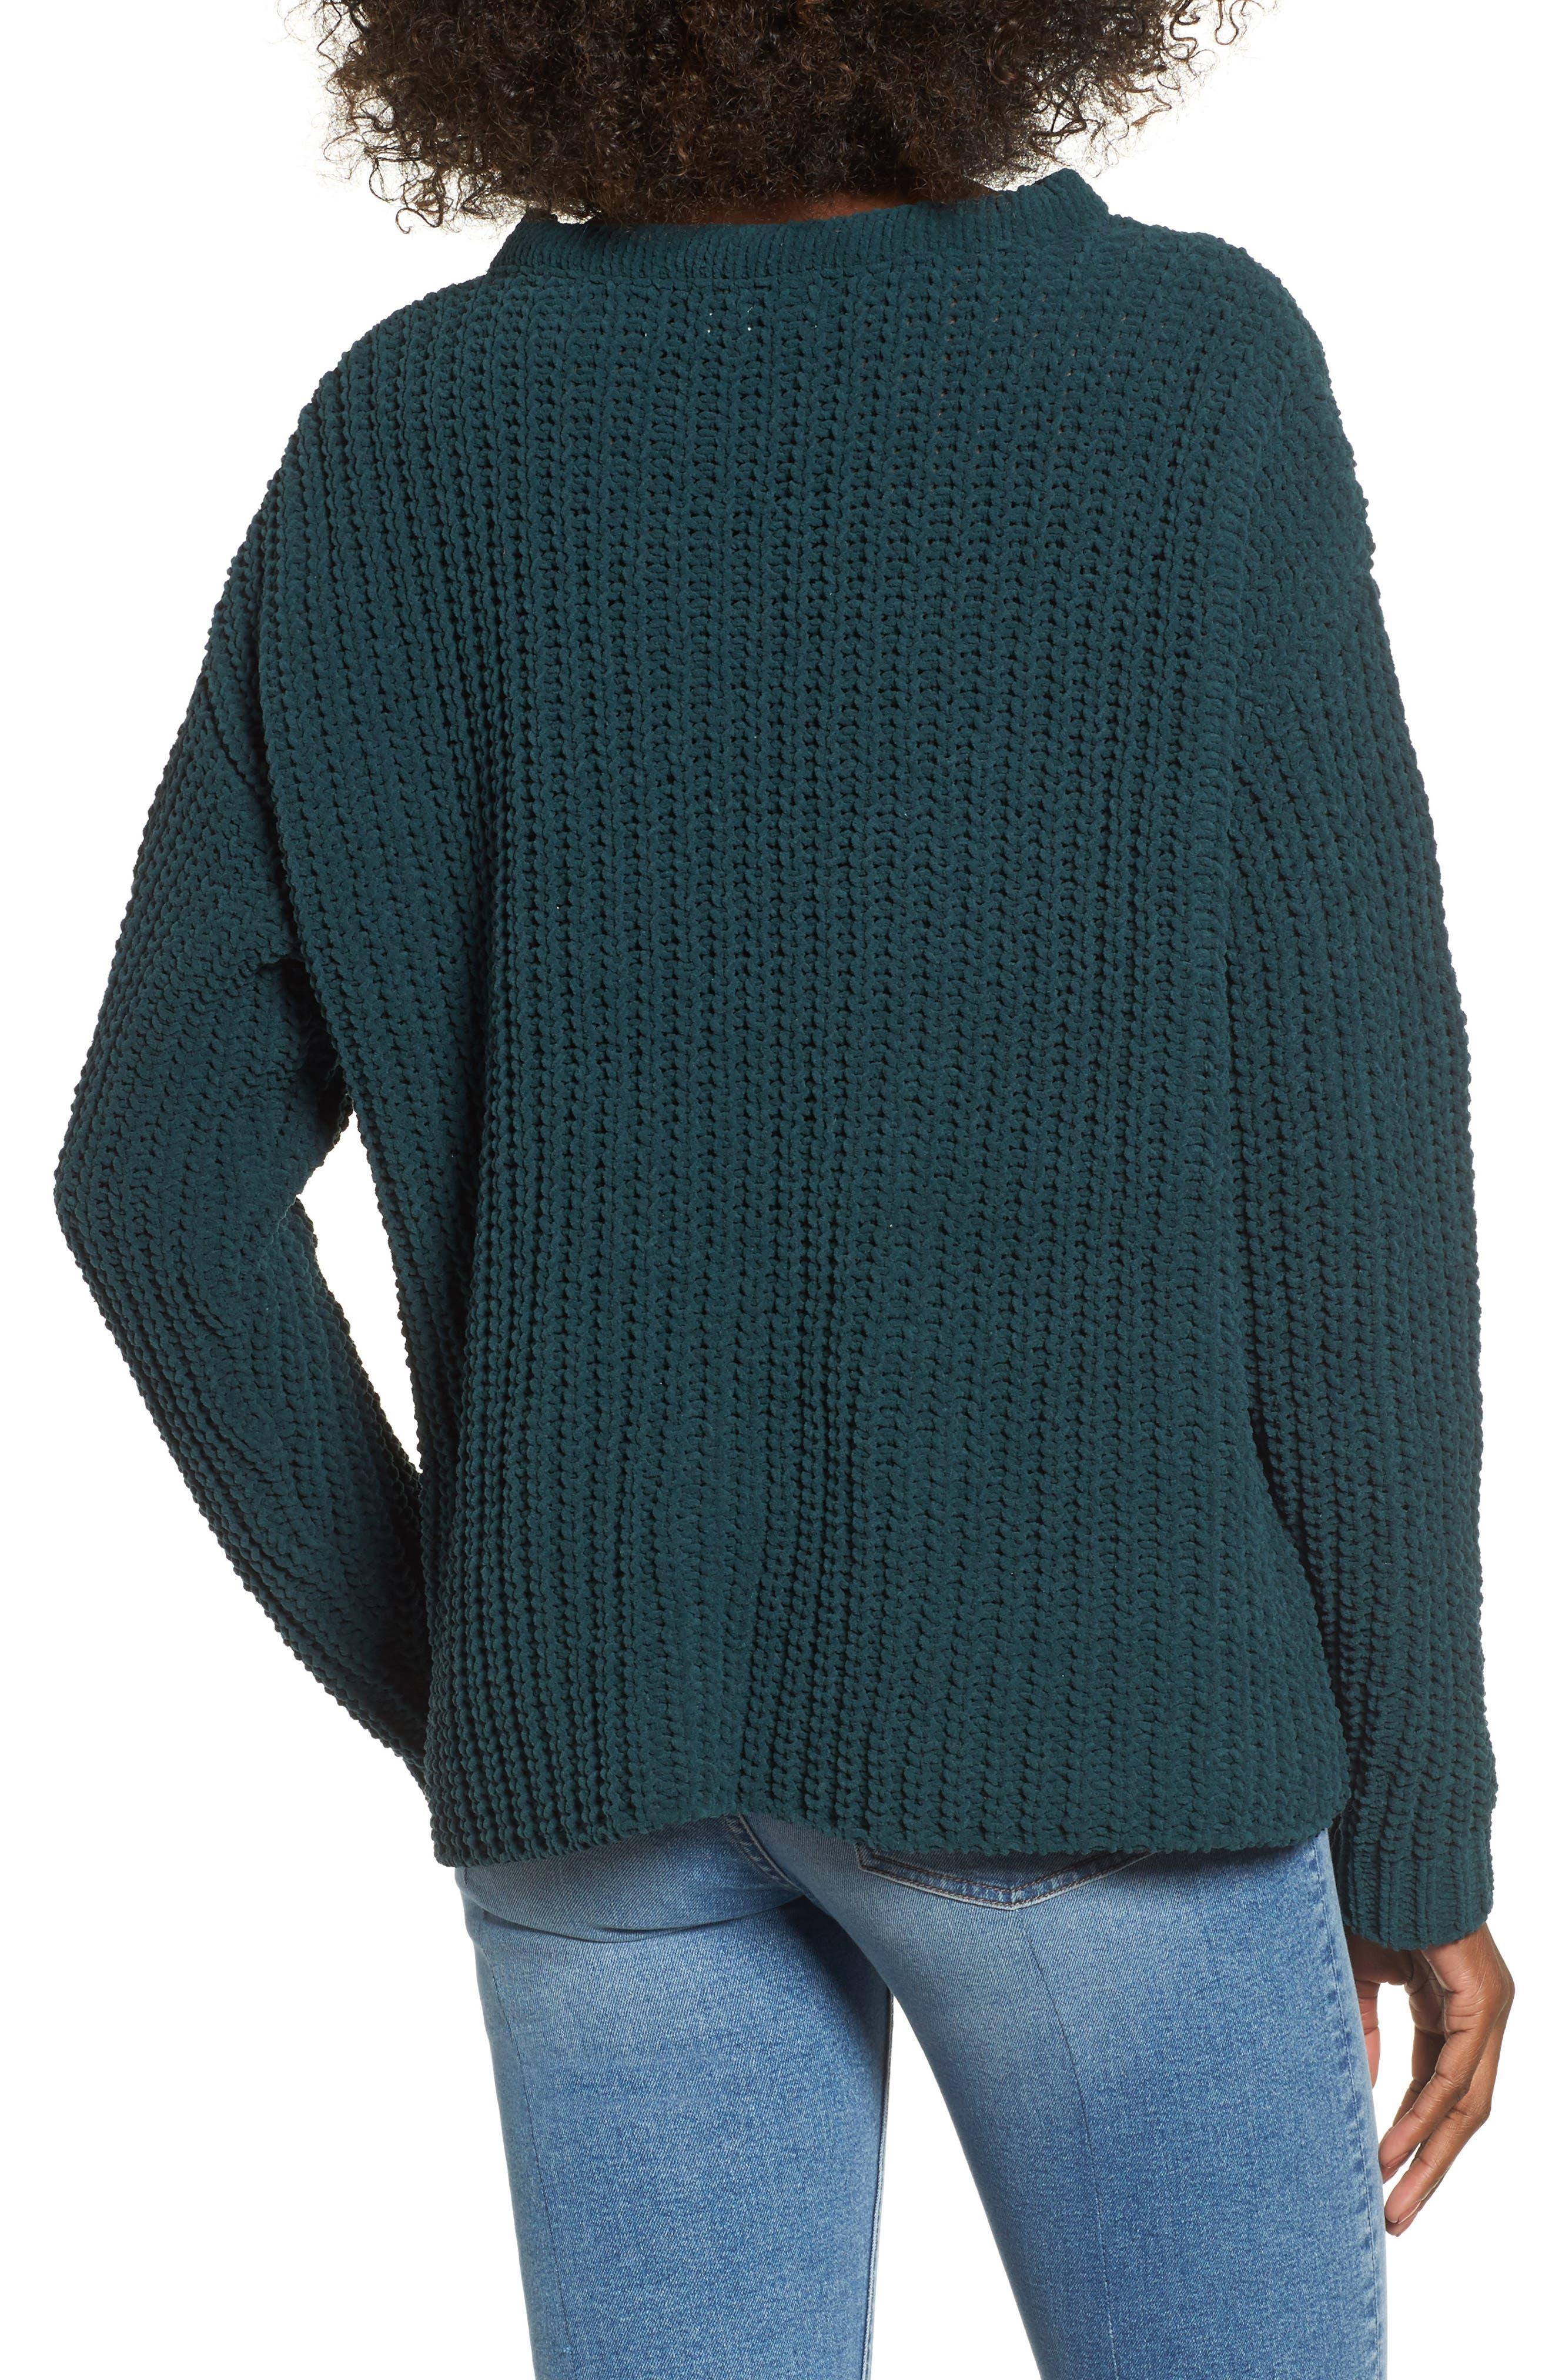 Mary Lous Choker Sweater,                             Alternate thumbnail 2, color,                             300